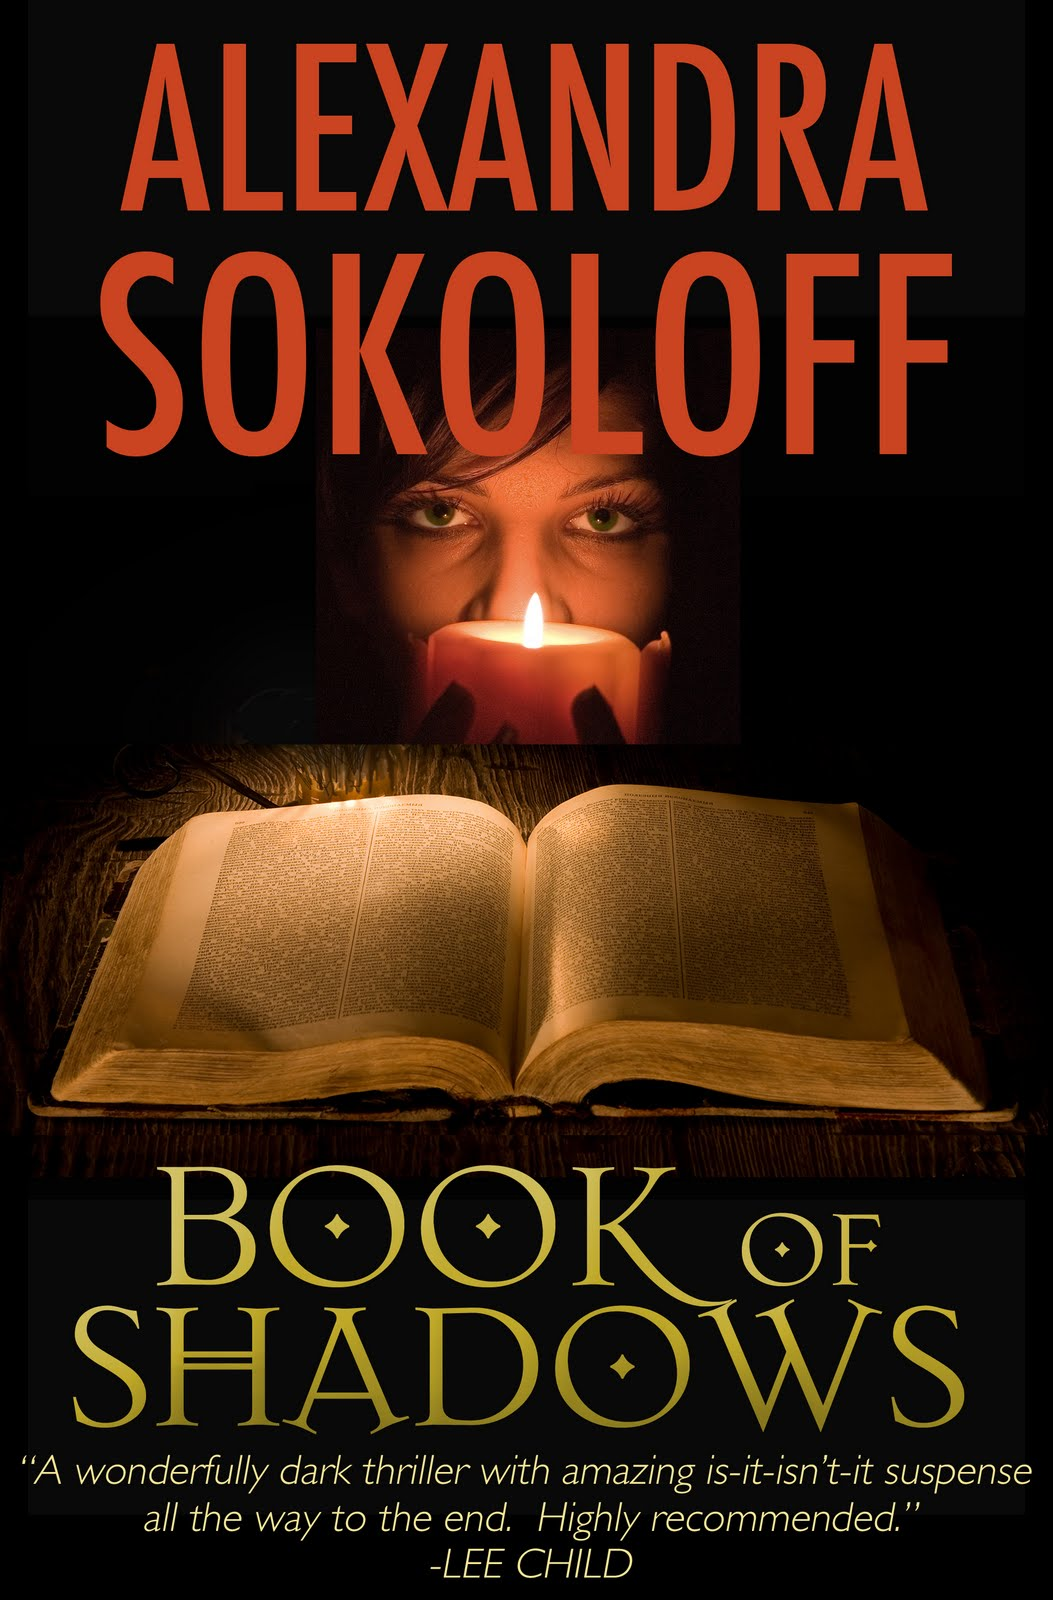 BookOfShadowsFINAL2